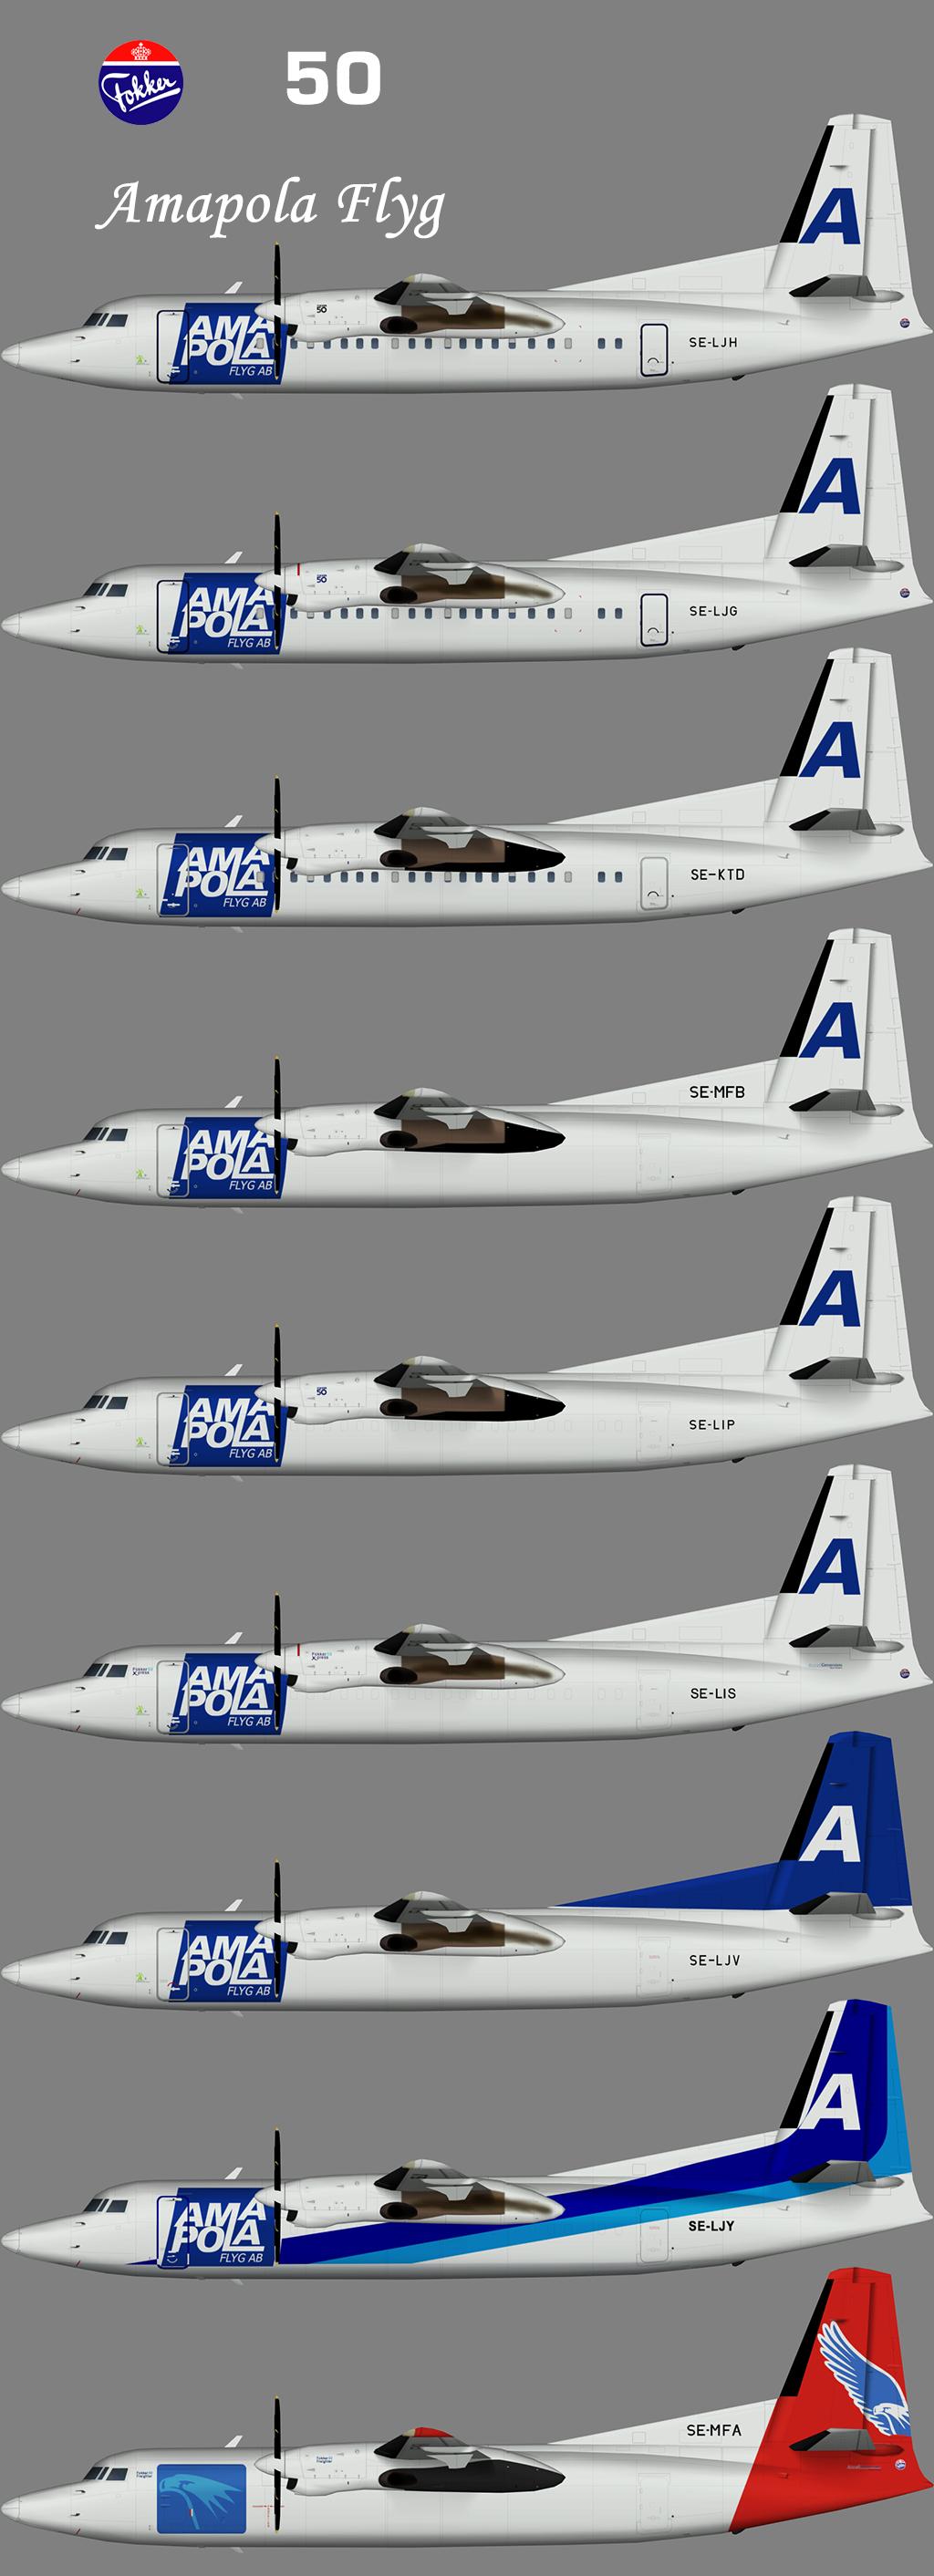 aif50apf